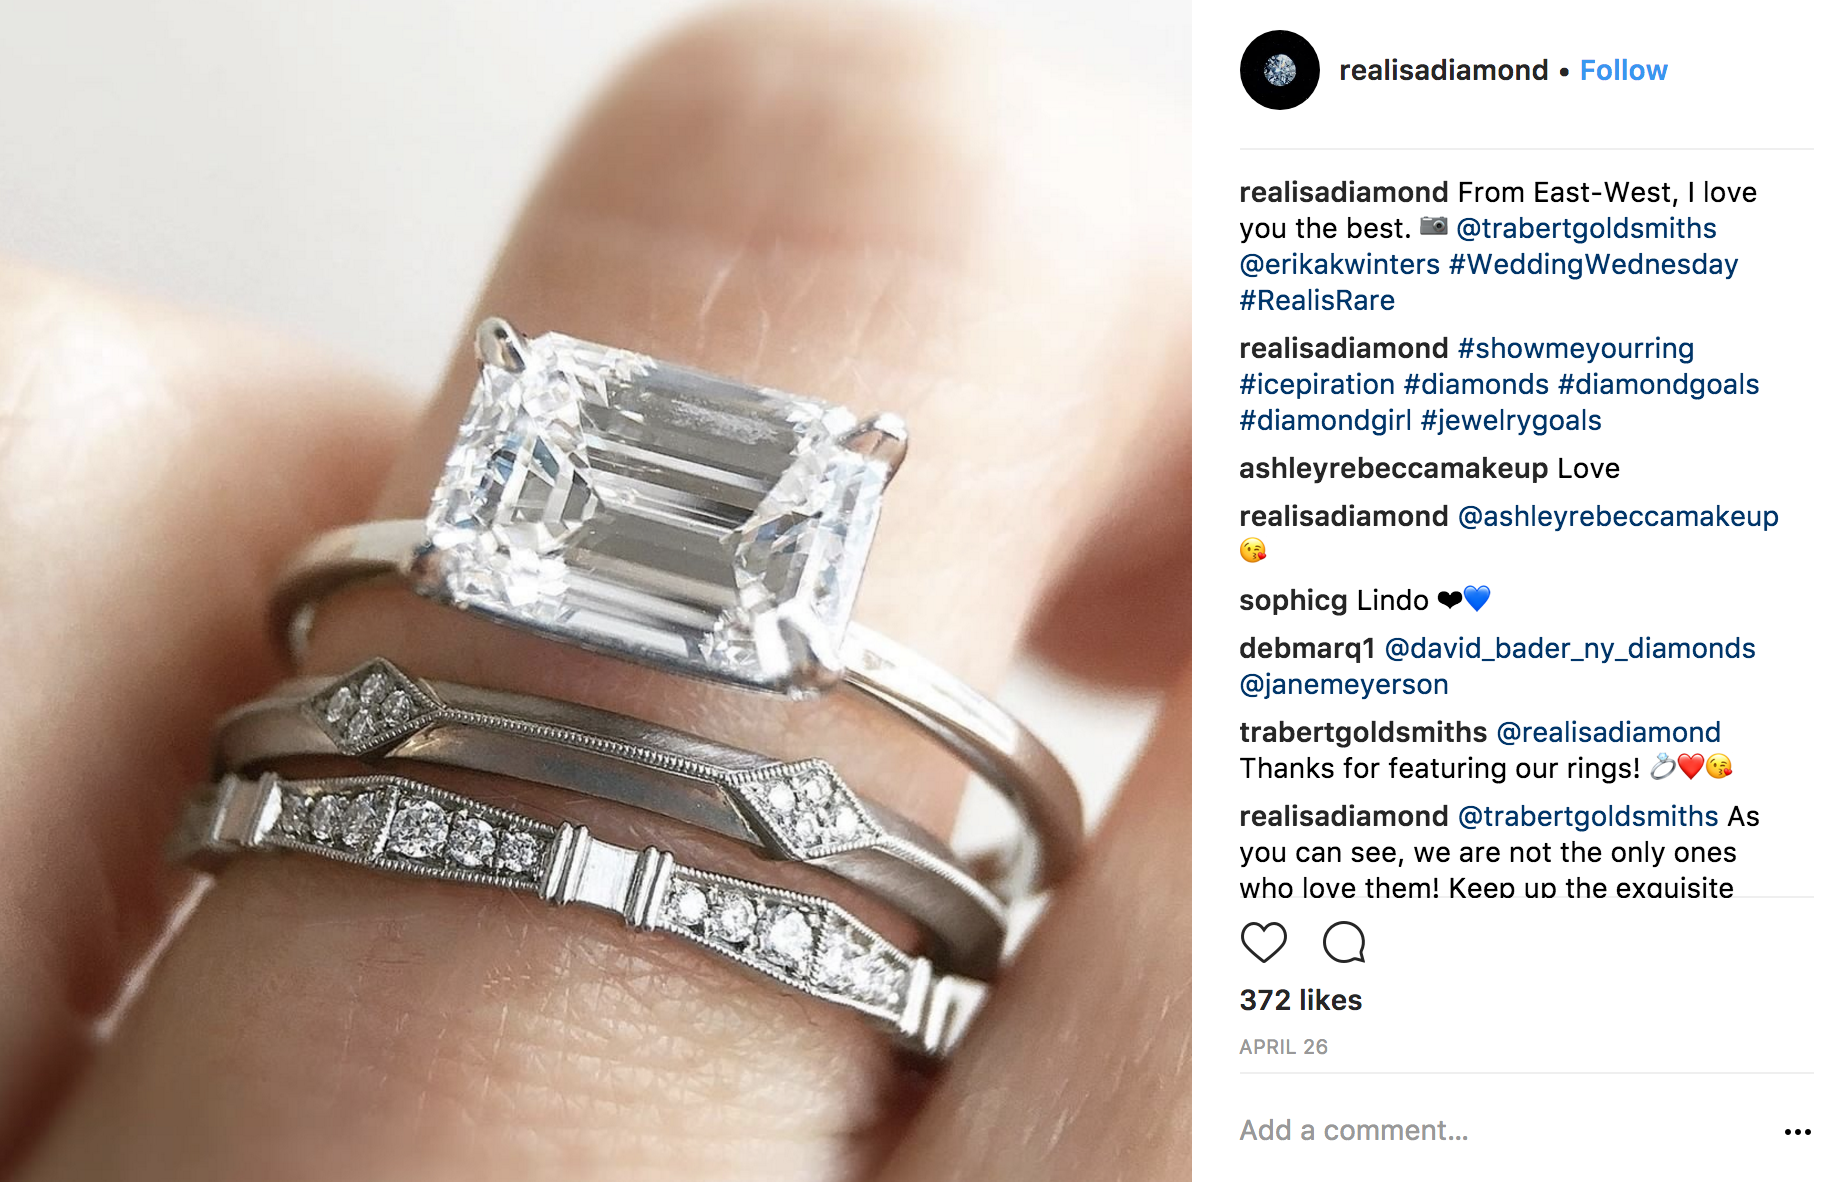 Realisadiamond Instagram photo